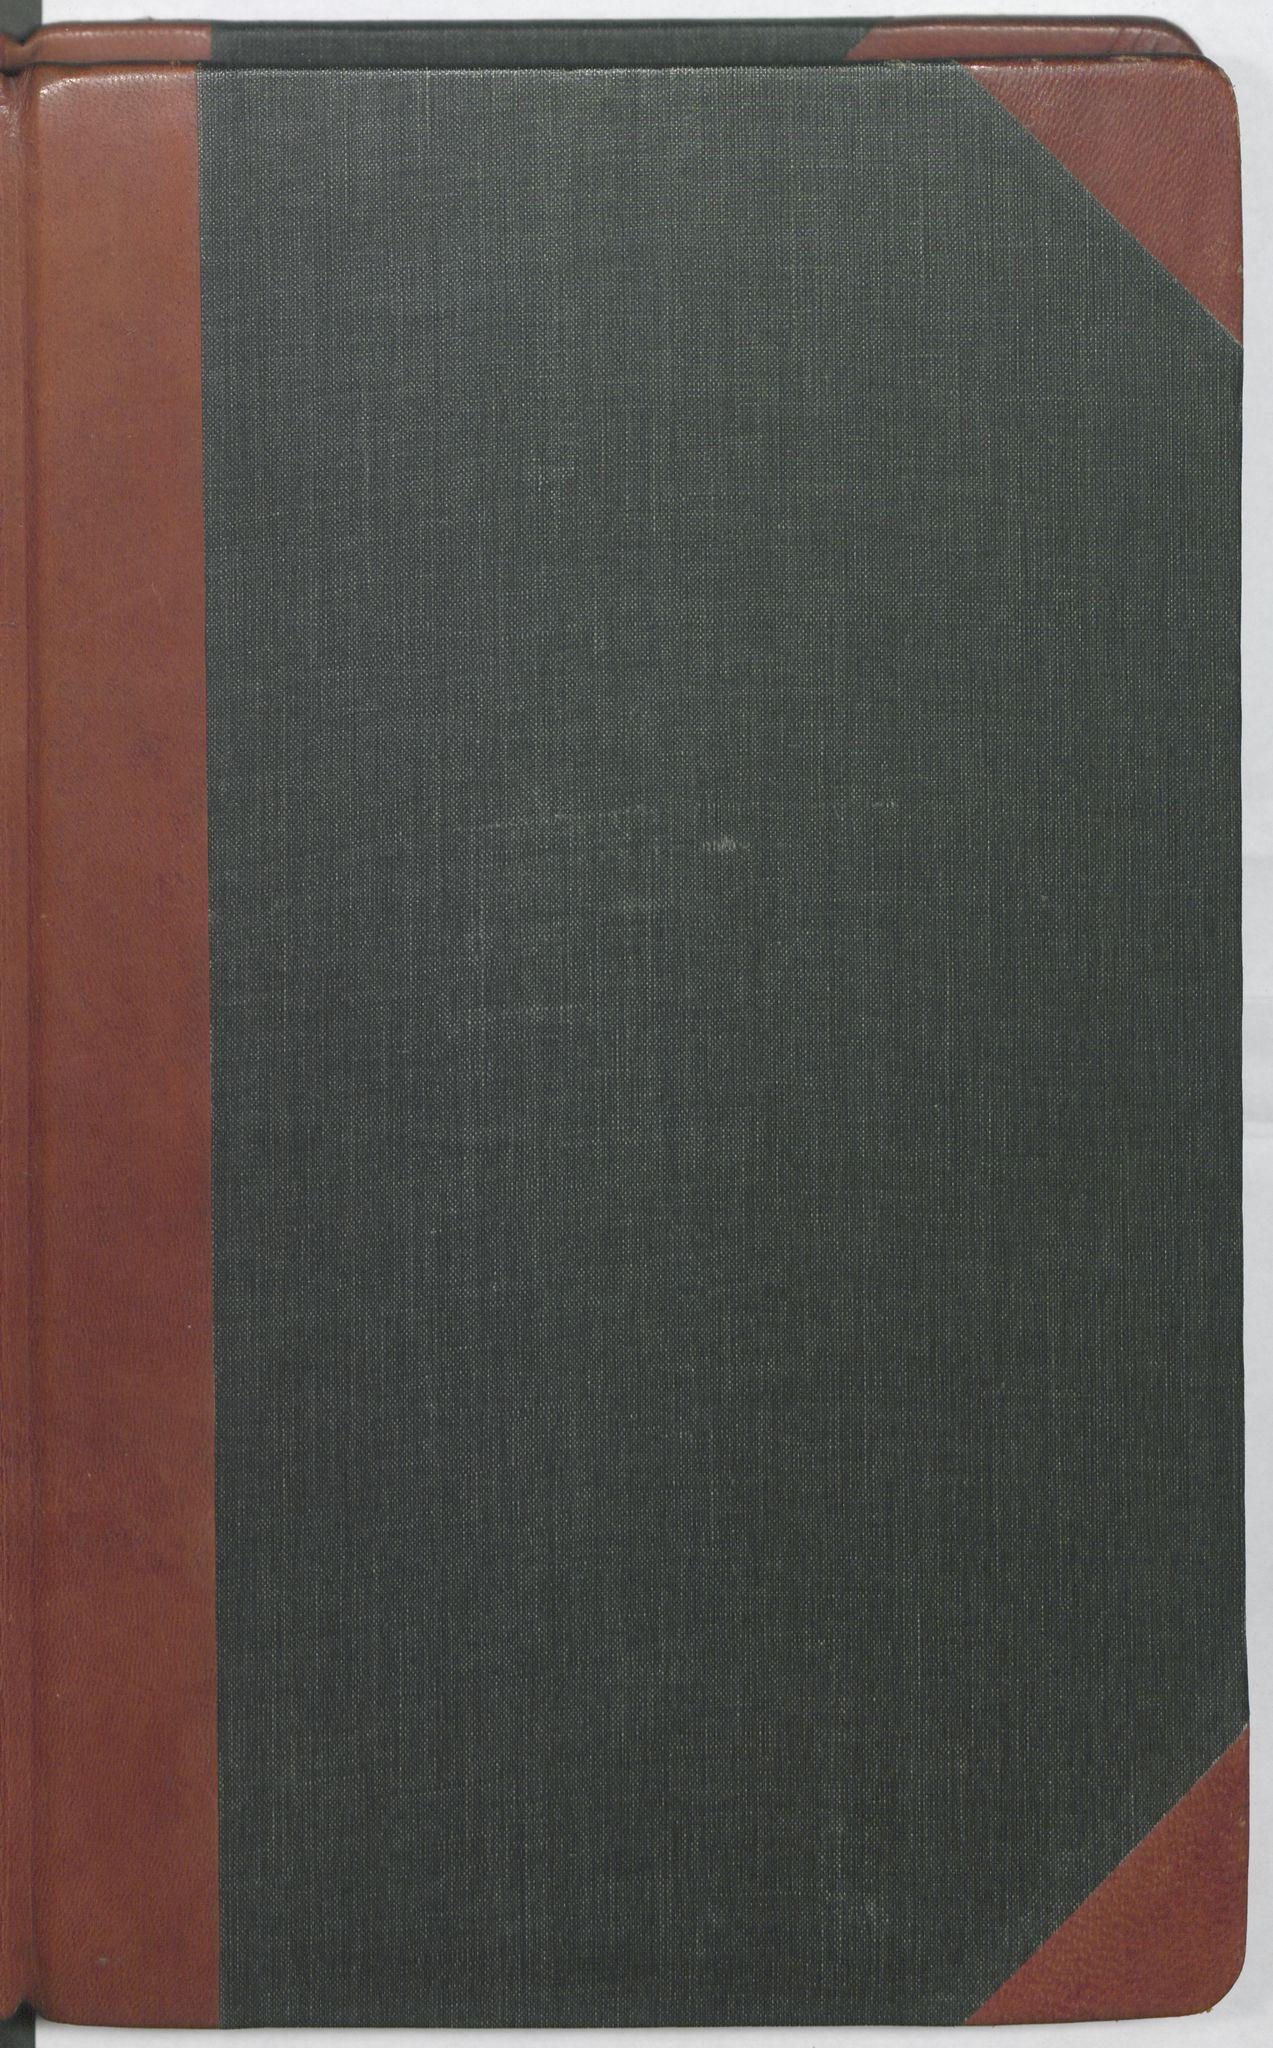 RA, Departementene i 1814, Fc/L0039: Journal A, 1814, s. 2